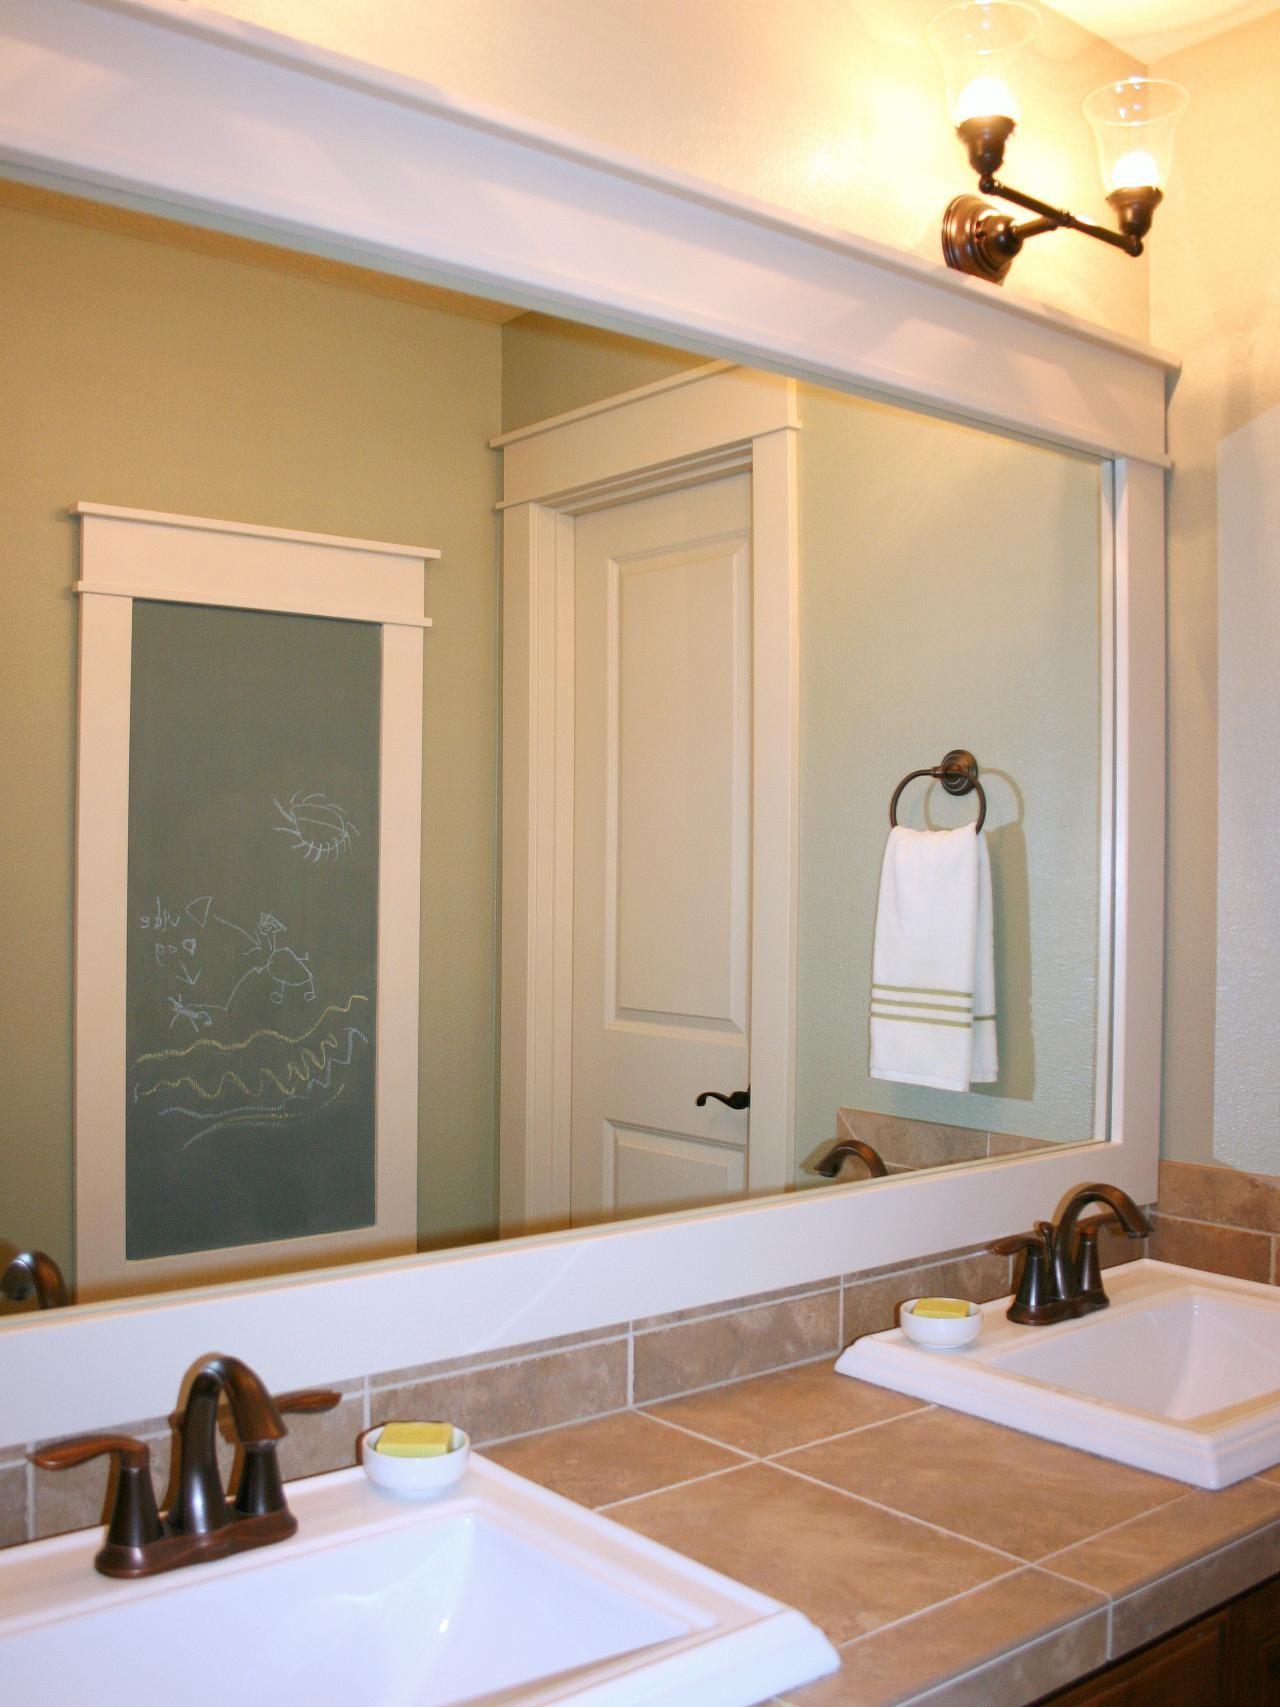 Interior bathroom rectangle white framed bathroom mirror decor with